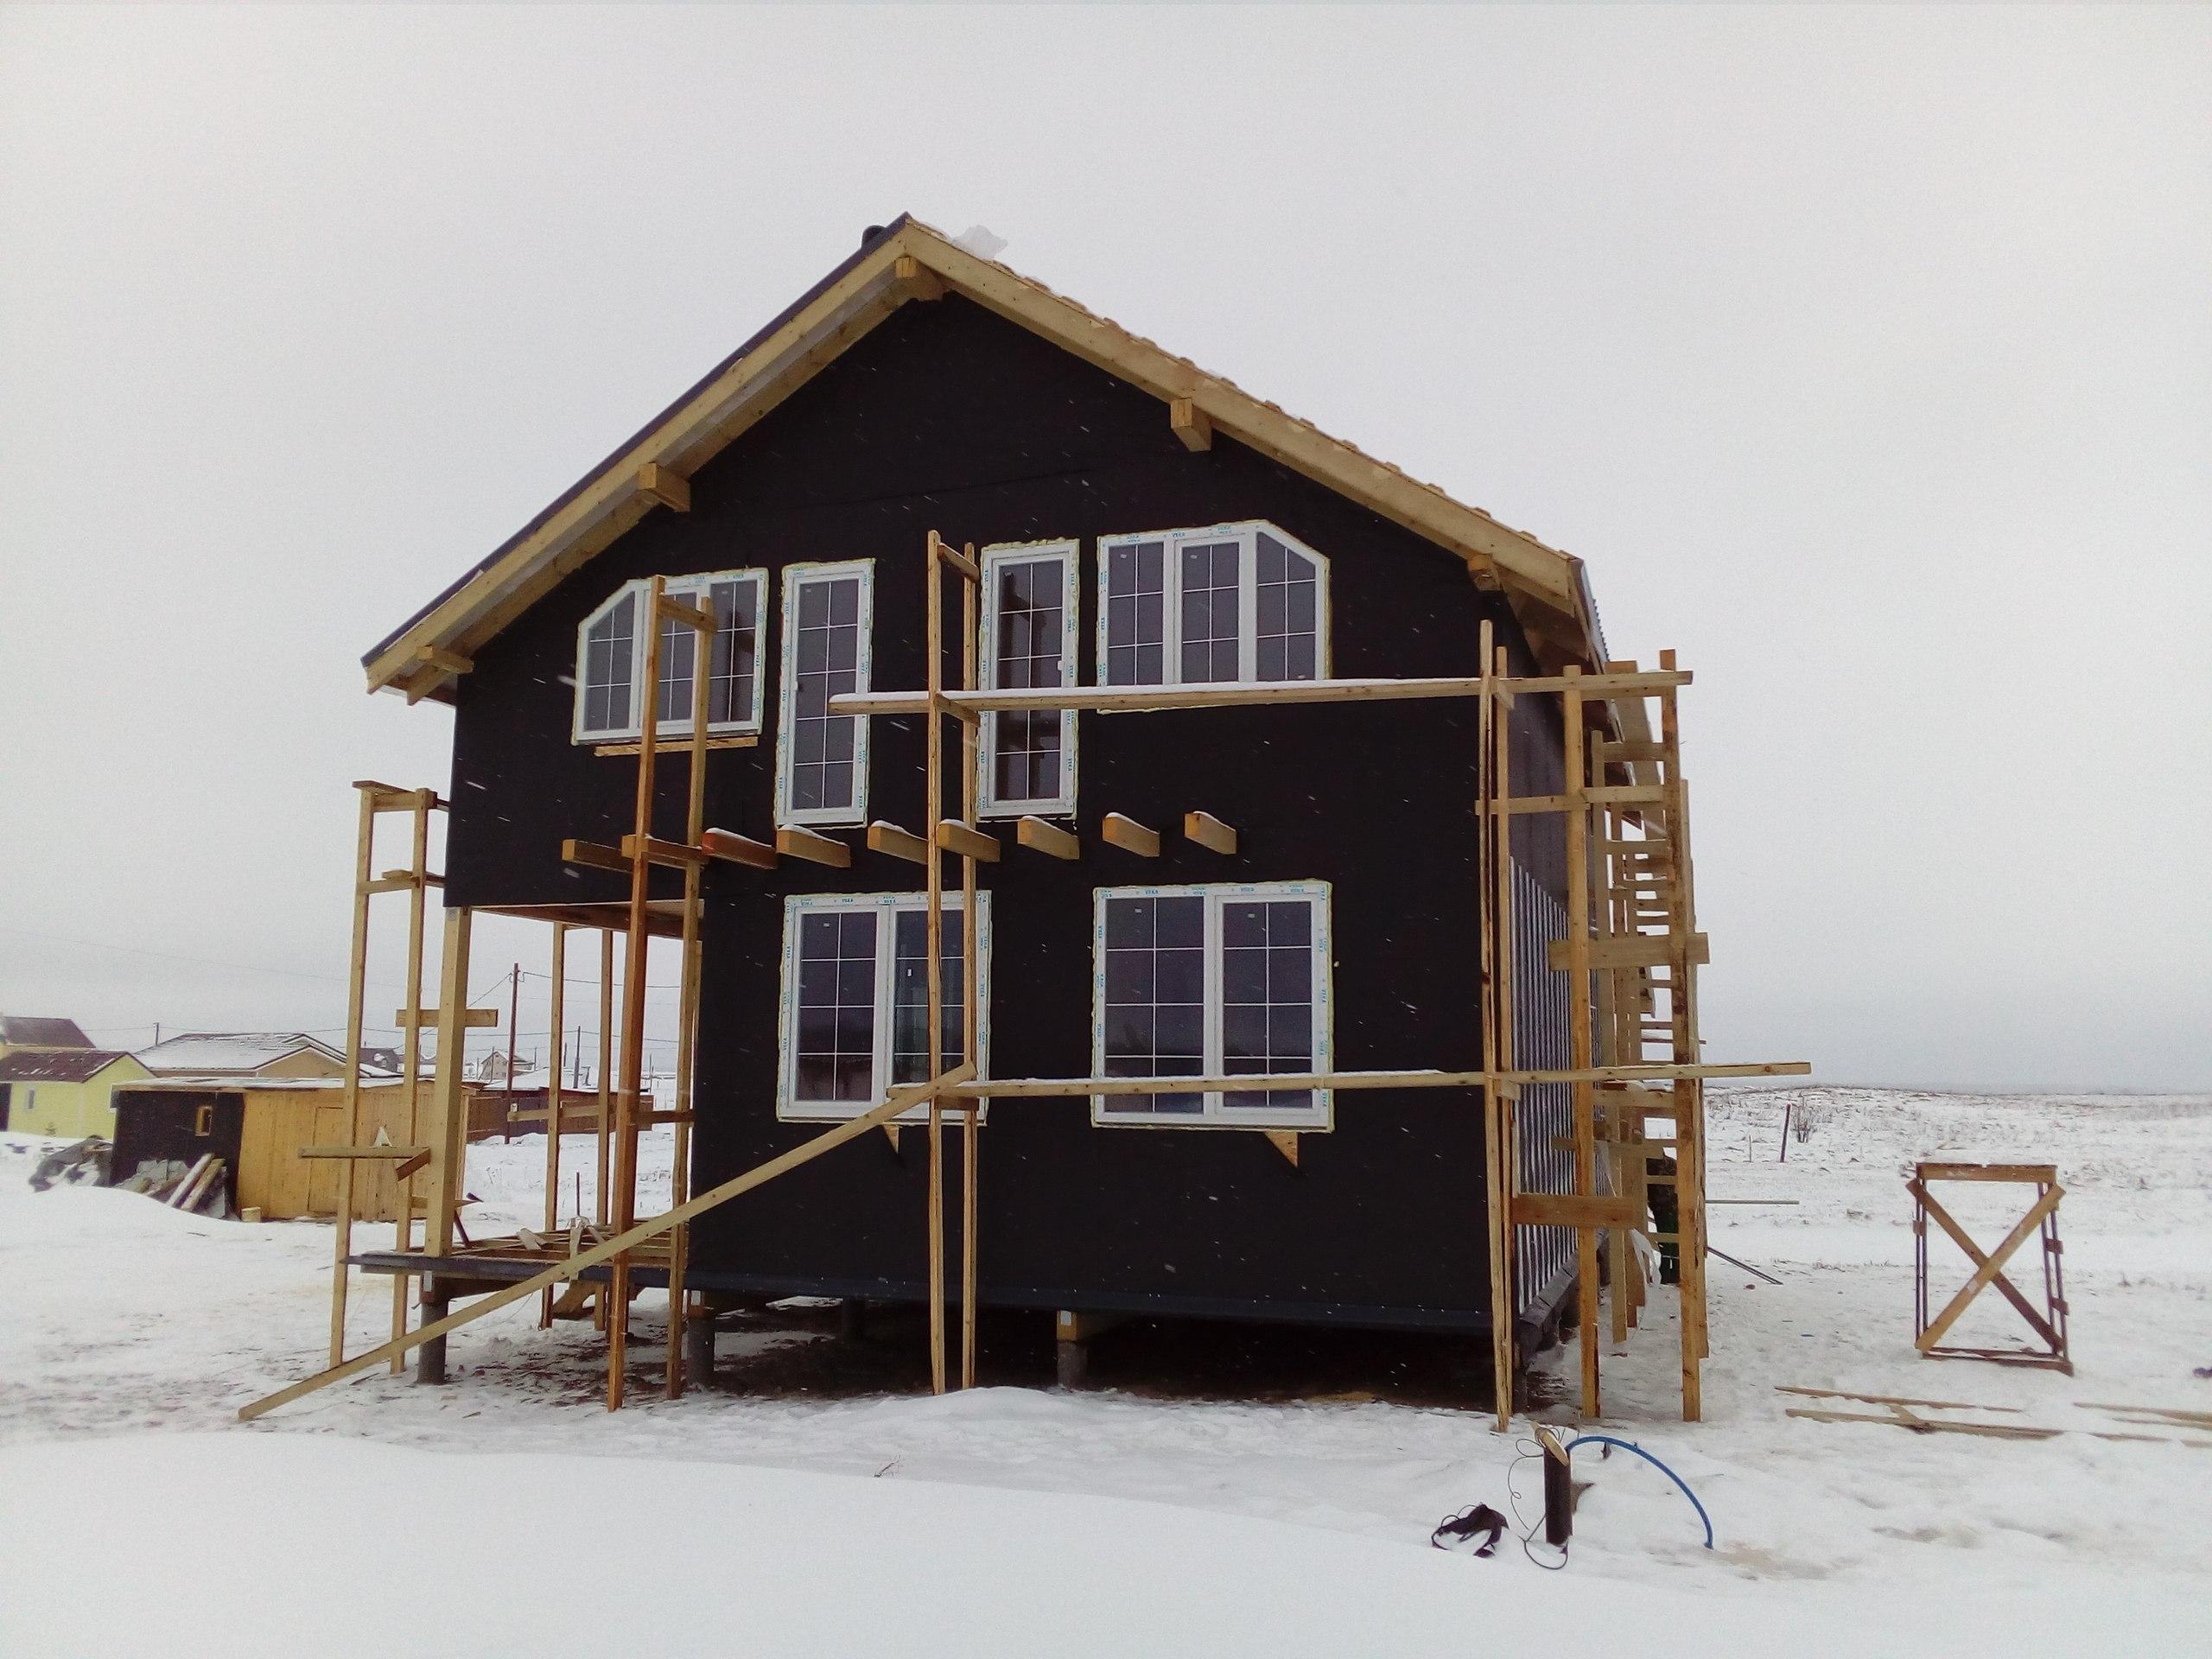 фото дома из сип панелей №5 сокули